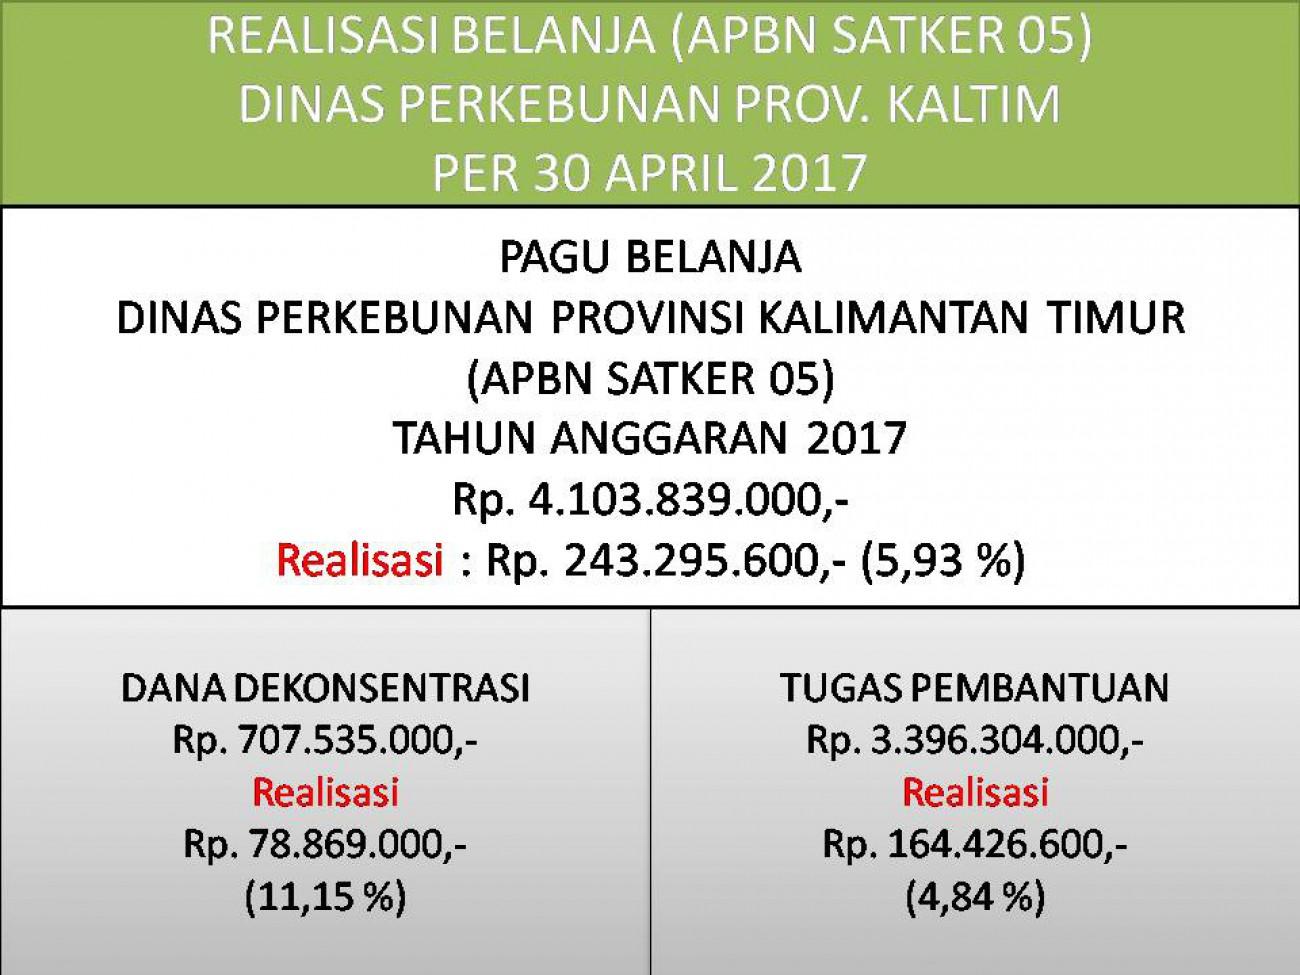 Laporan Realisasi APBN Satker 05 (Direktorat Jenderal Perkebunan) Dinas Perkebunan Prov. Kaltim Bulan April 2017